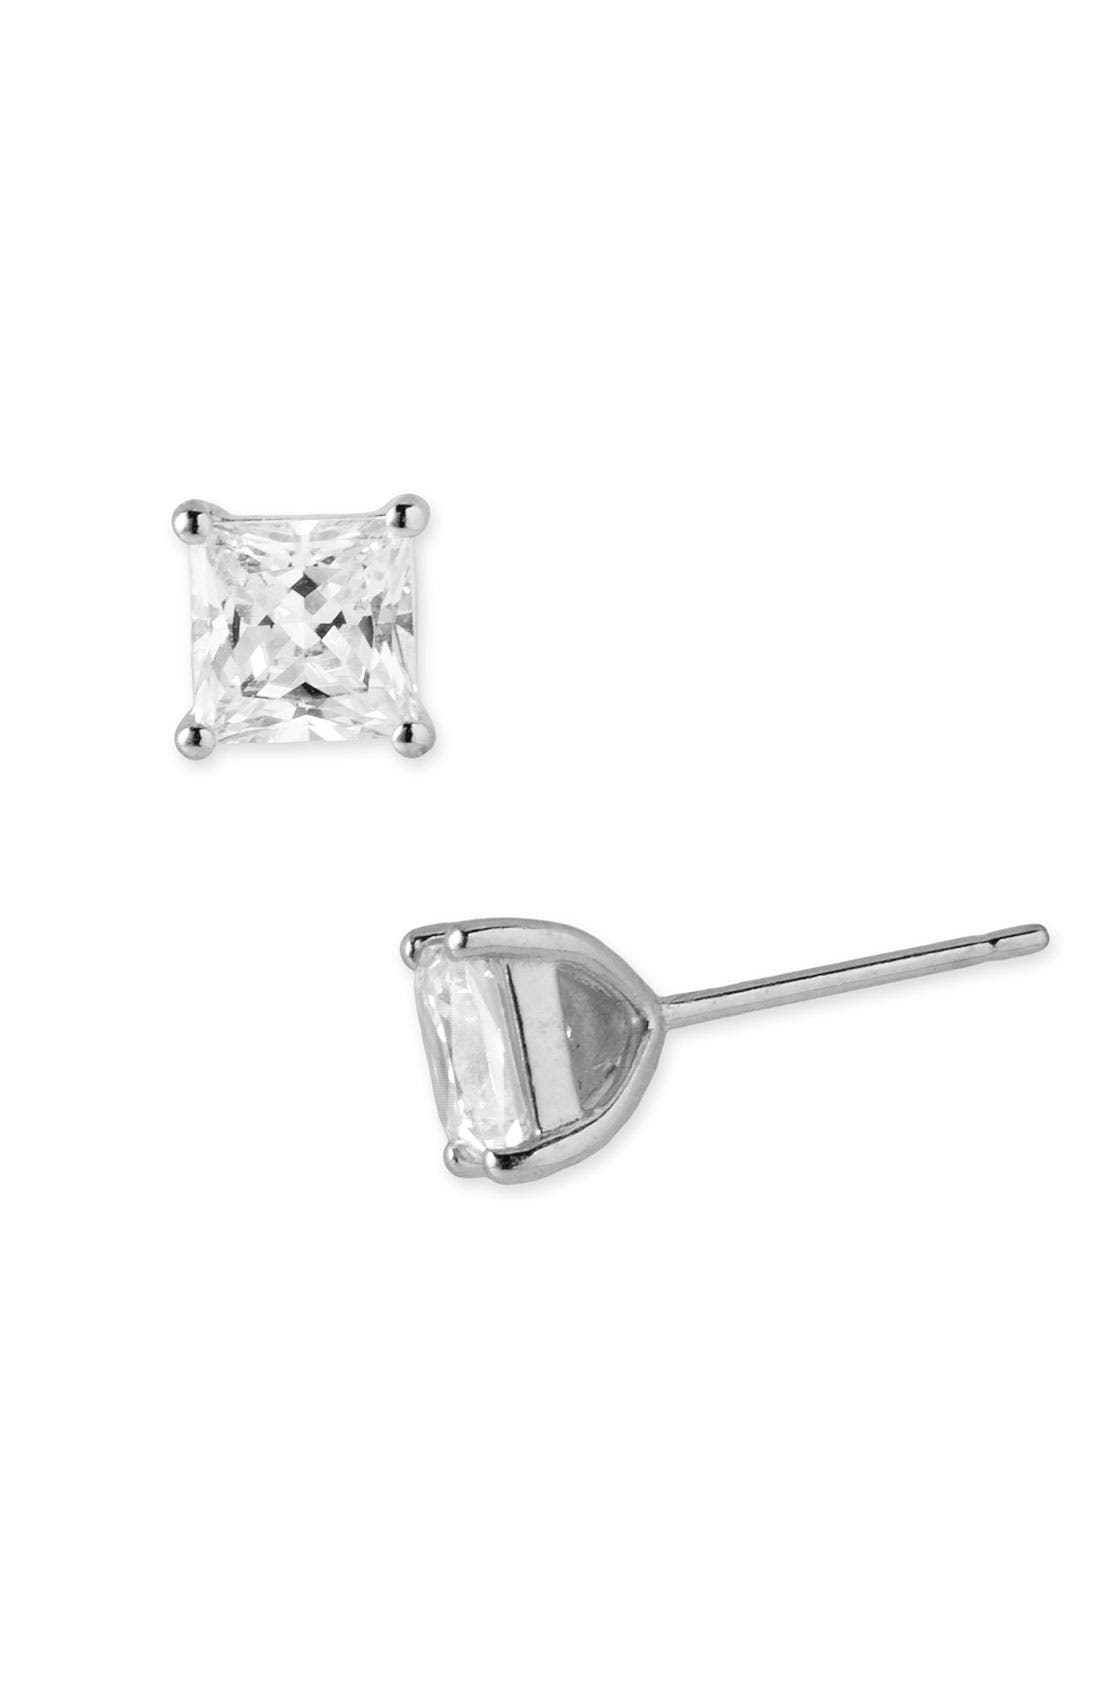 Main Image - Nordstrom 2ct tw Princess Stud Earrings